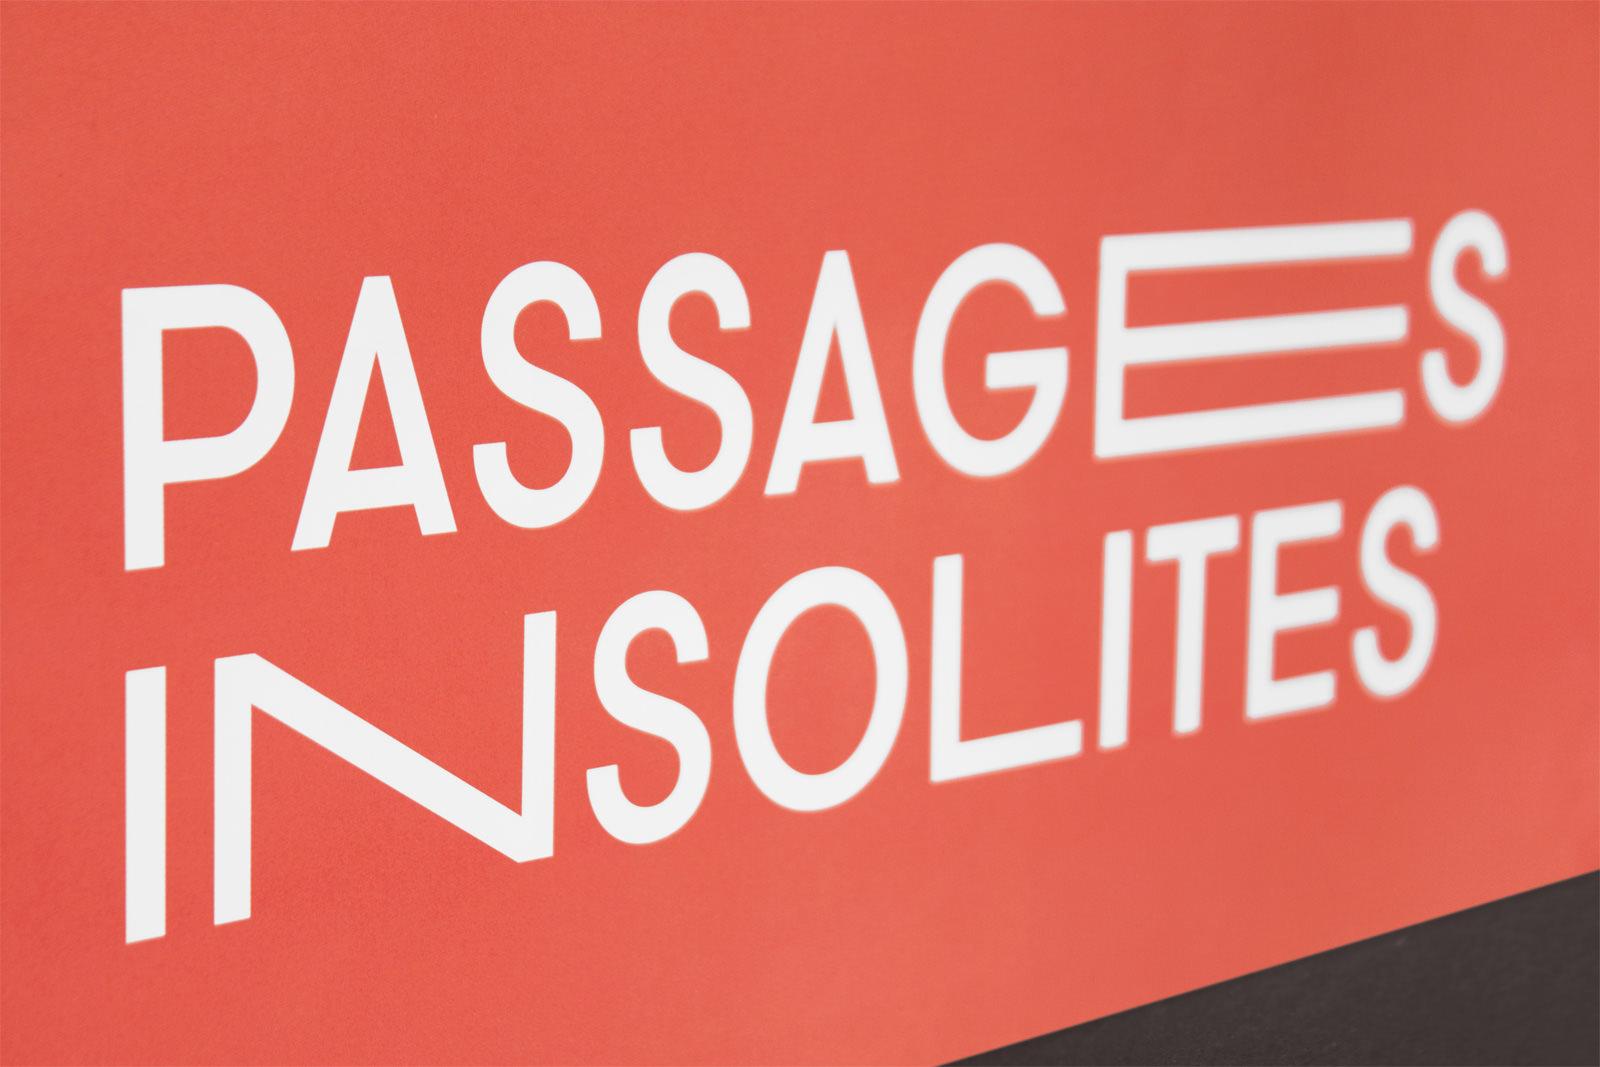 PassagesInsolites-JeremyHall-Figure-ExMuro-12.jpg